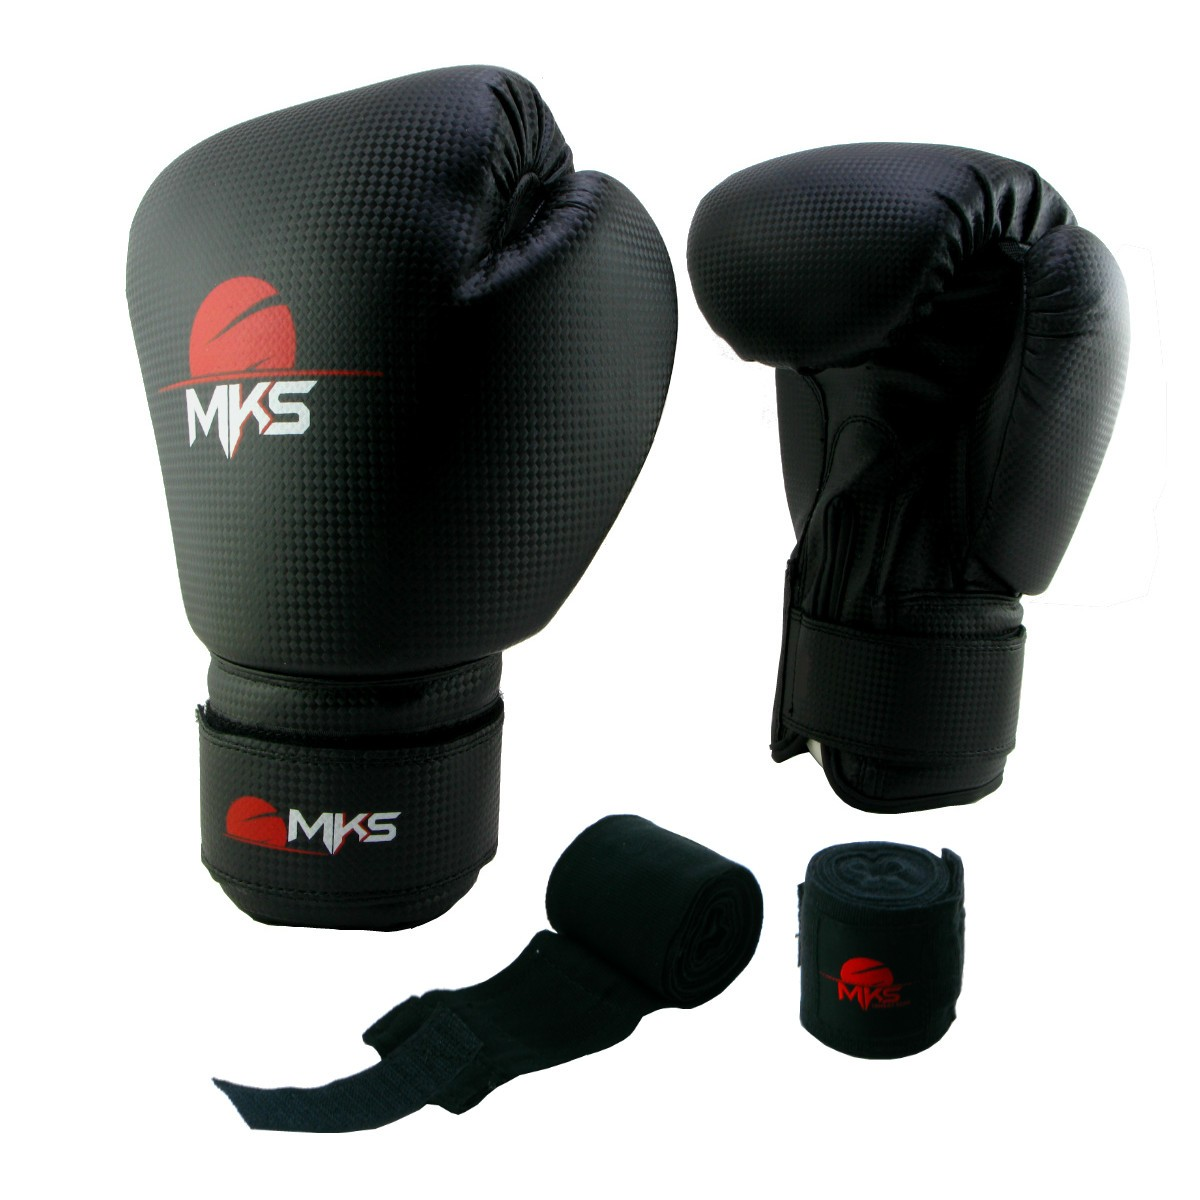 Luva de Boxe Prospect MKS Preta 16 oz + bandagem